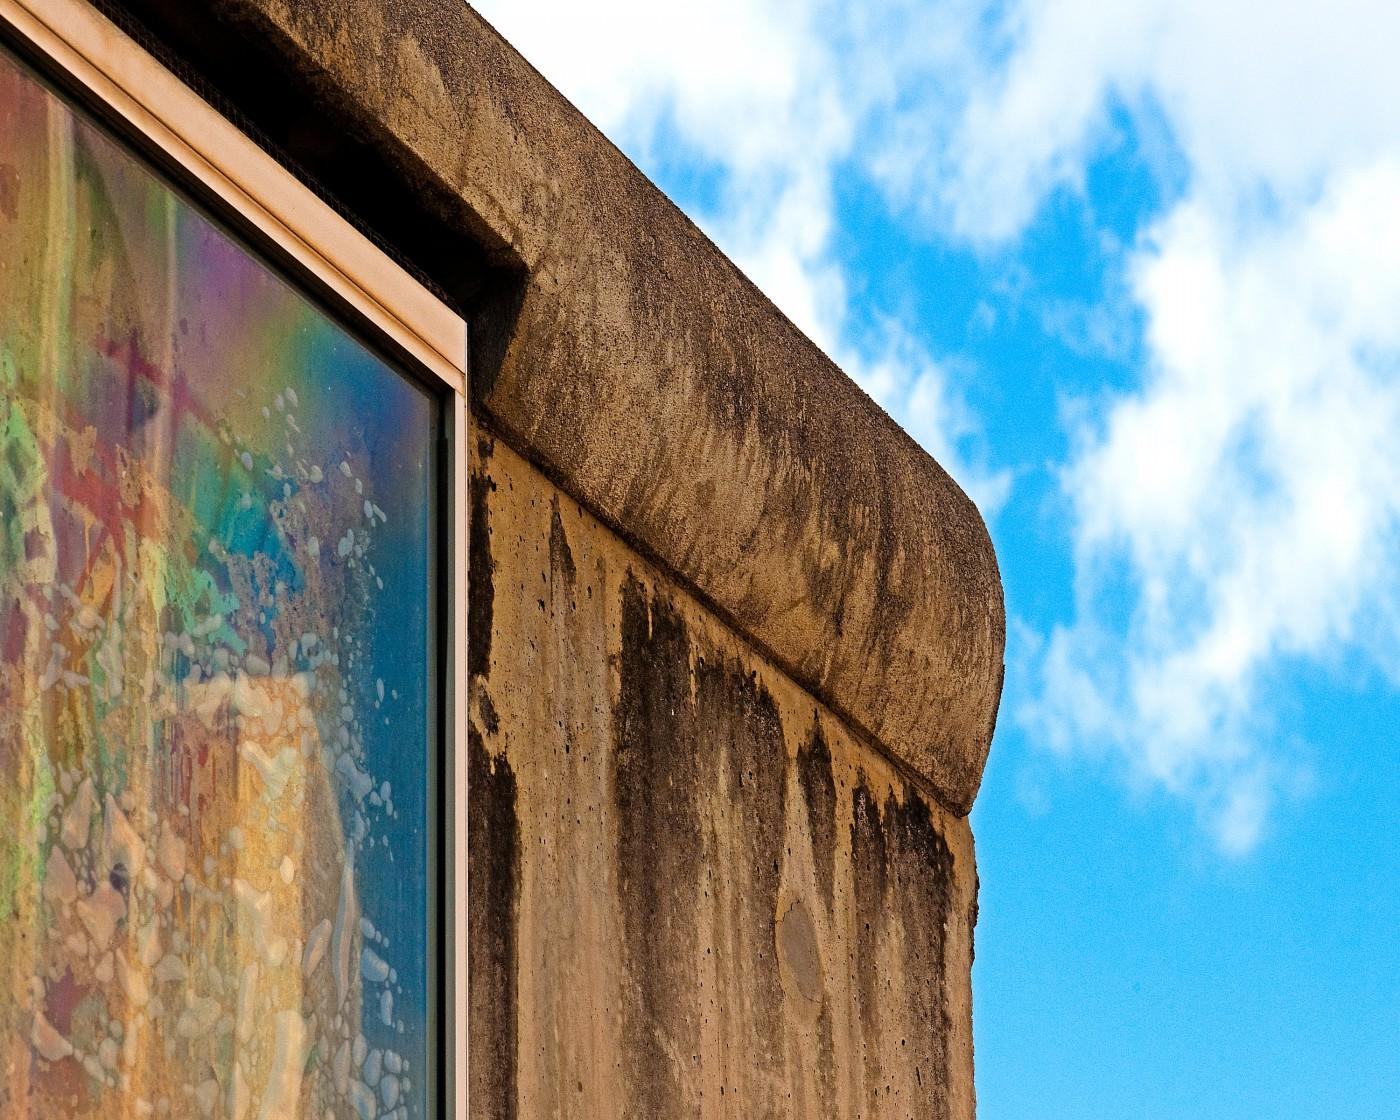 Frank Michael, </span><span><em>Untitled, 2008</em>, </span><span>Ink Jet Print, 22.5